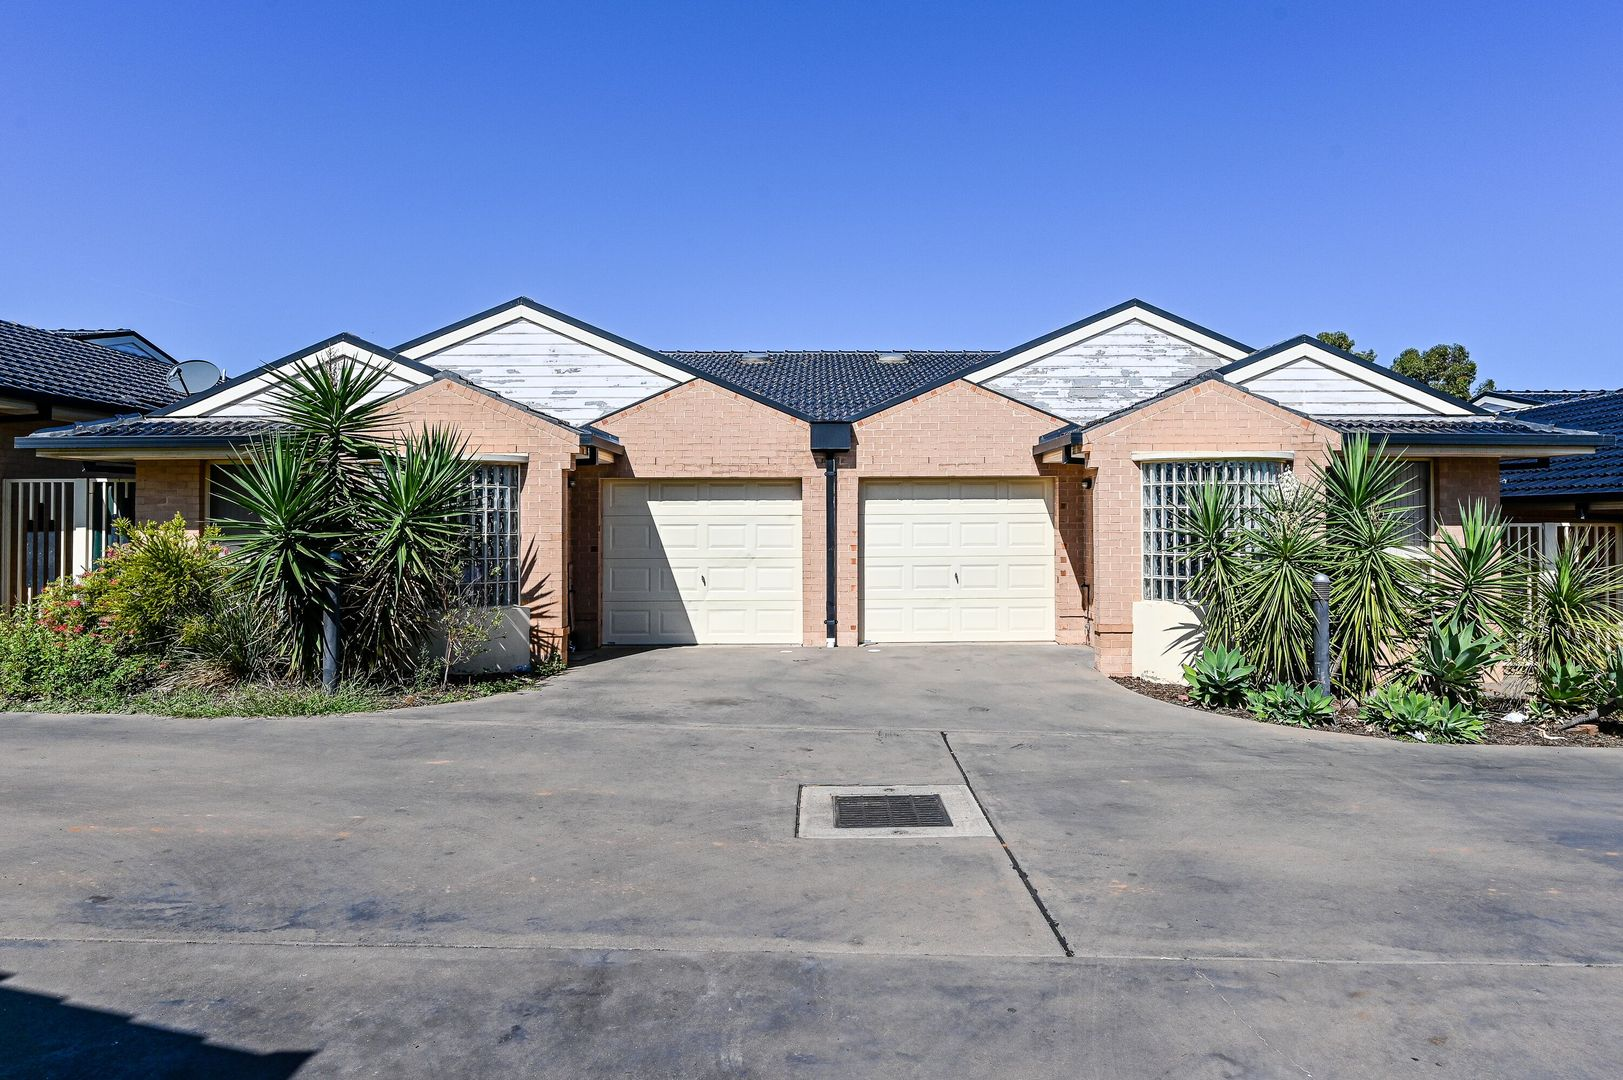 3/185 Palm Avenue, Leeton NSW 2705, Image 1